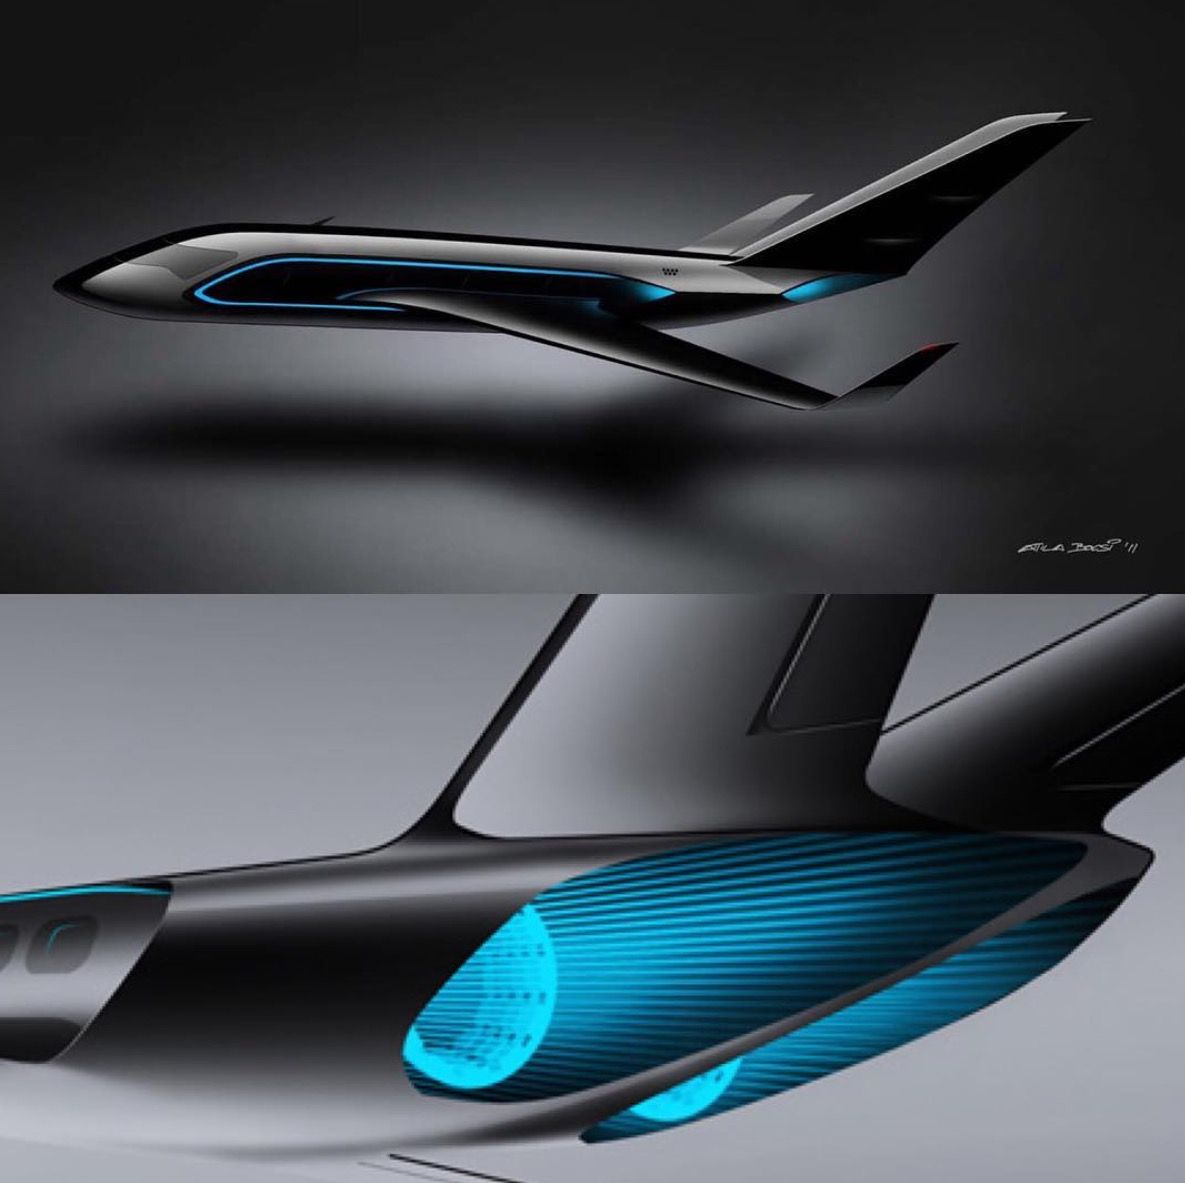 Peugeot Design Lab Plane Design Plane Design Aircraft Design Private Jet